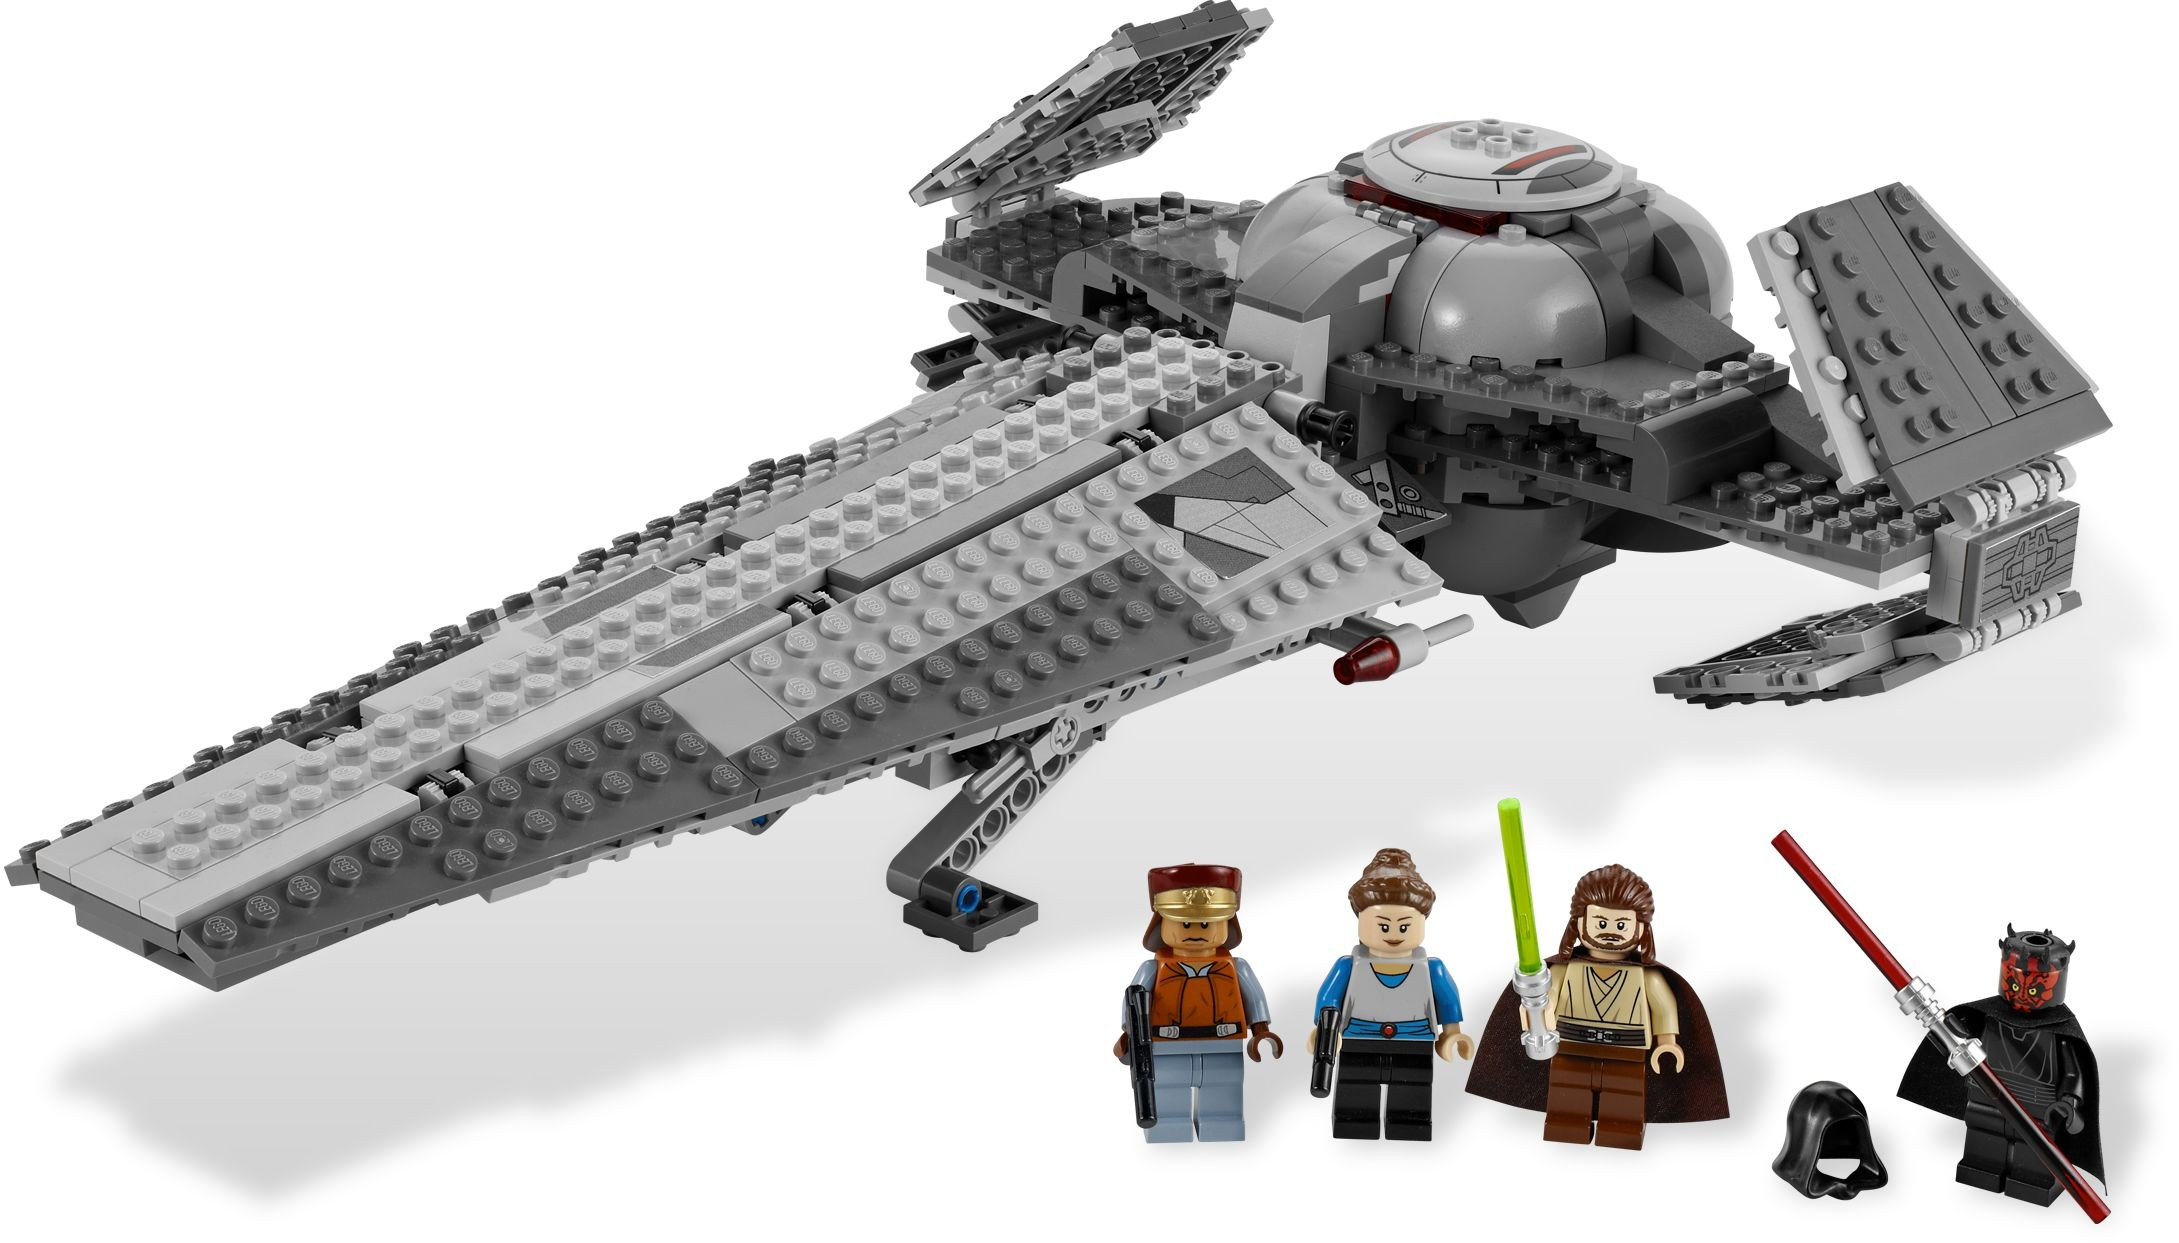 Lego Qui-Gon Jinn 7961 Reddish Brown Legs Episode 1 Star Wars Minifigure